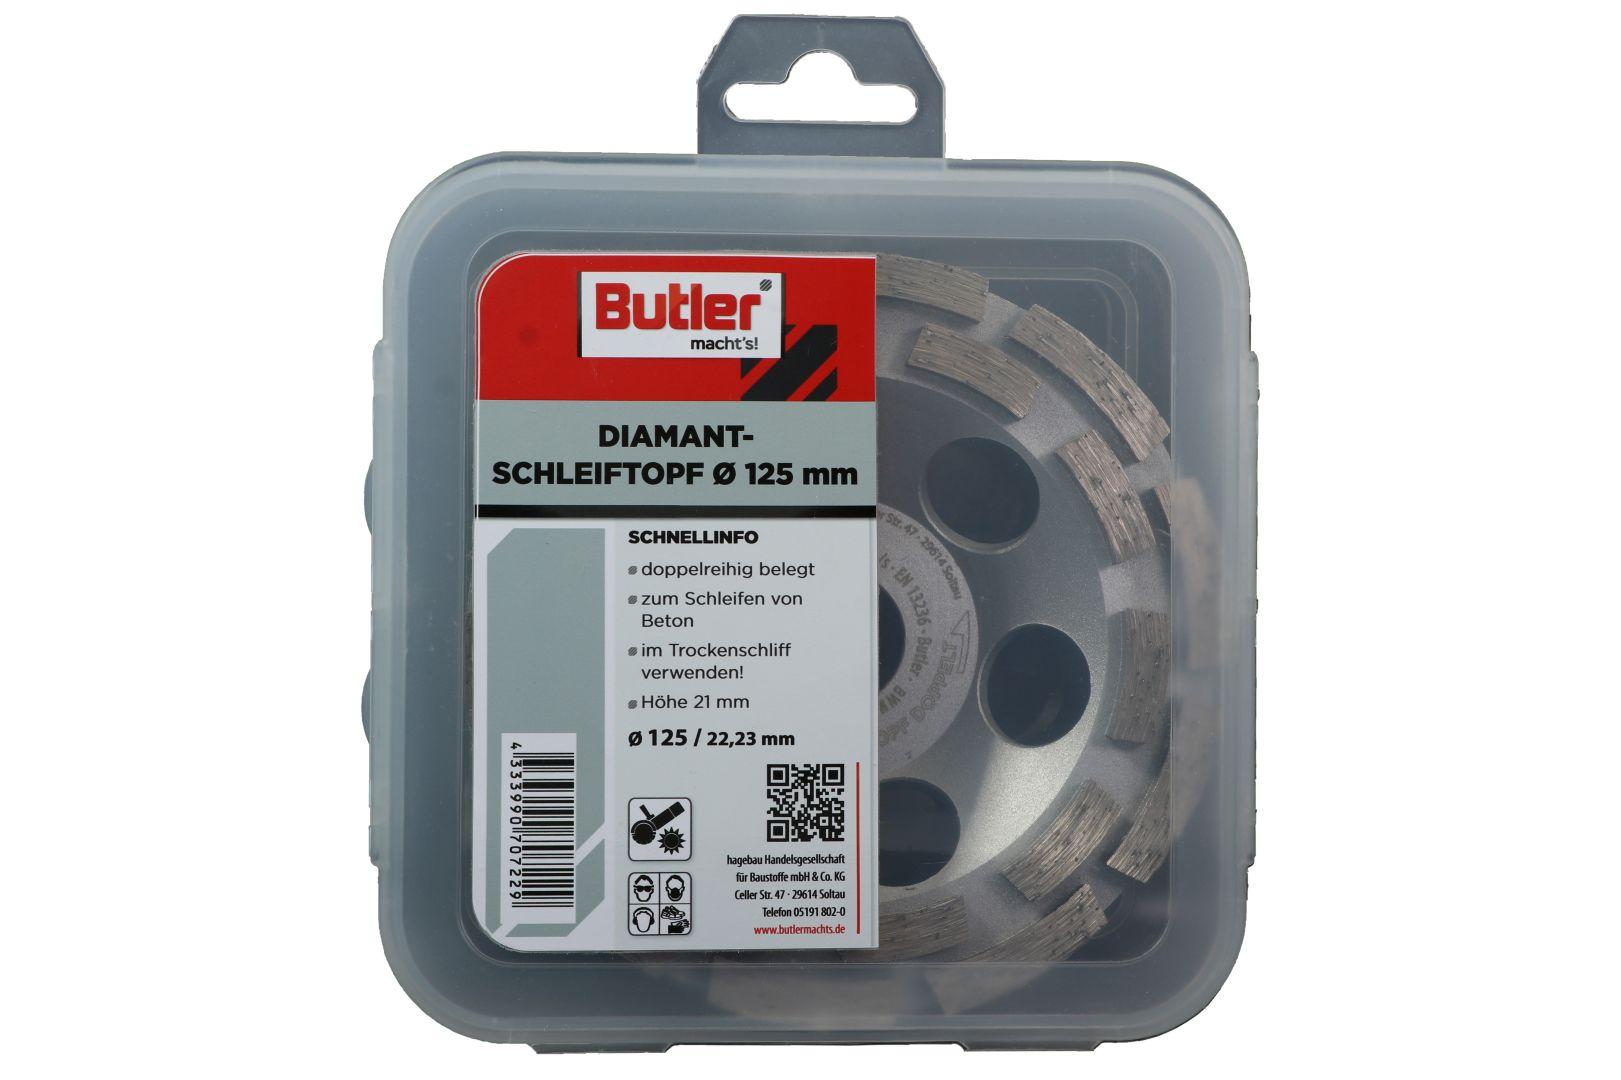 Butler macht's! Diamant-Schleiftopf, Schneidrand doppelt, Ø 125 mm